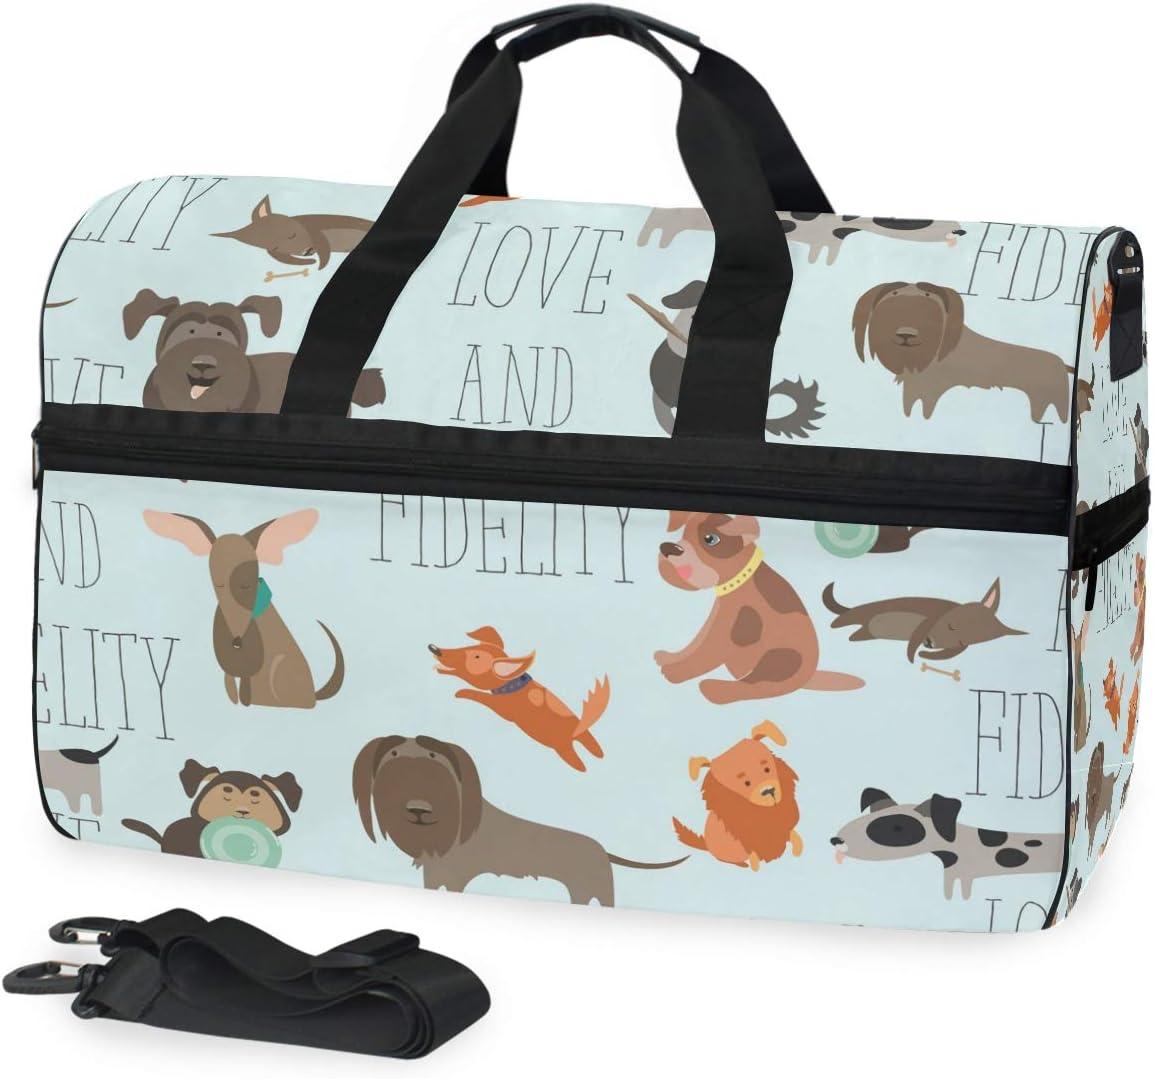 FANTAZIO Animal Dog Love And Fidelity Sports Duffle Bag Gym Bag Travel Duffel with Adjustable Strap